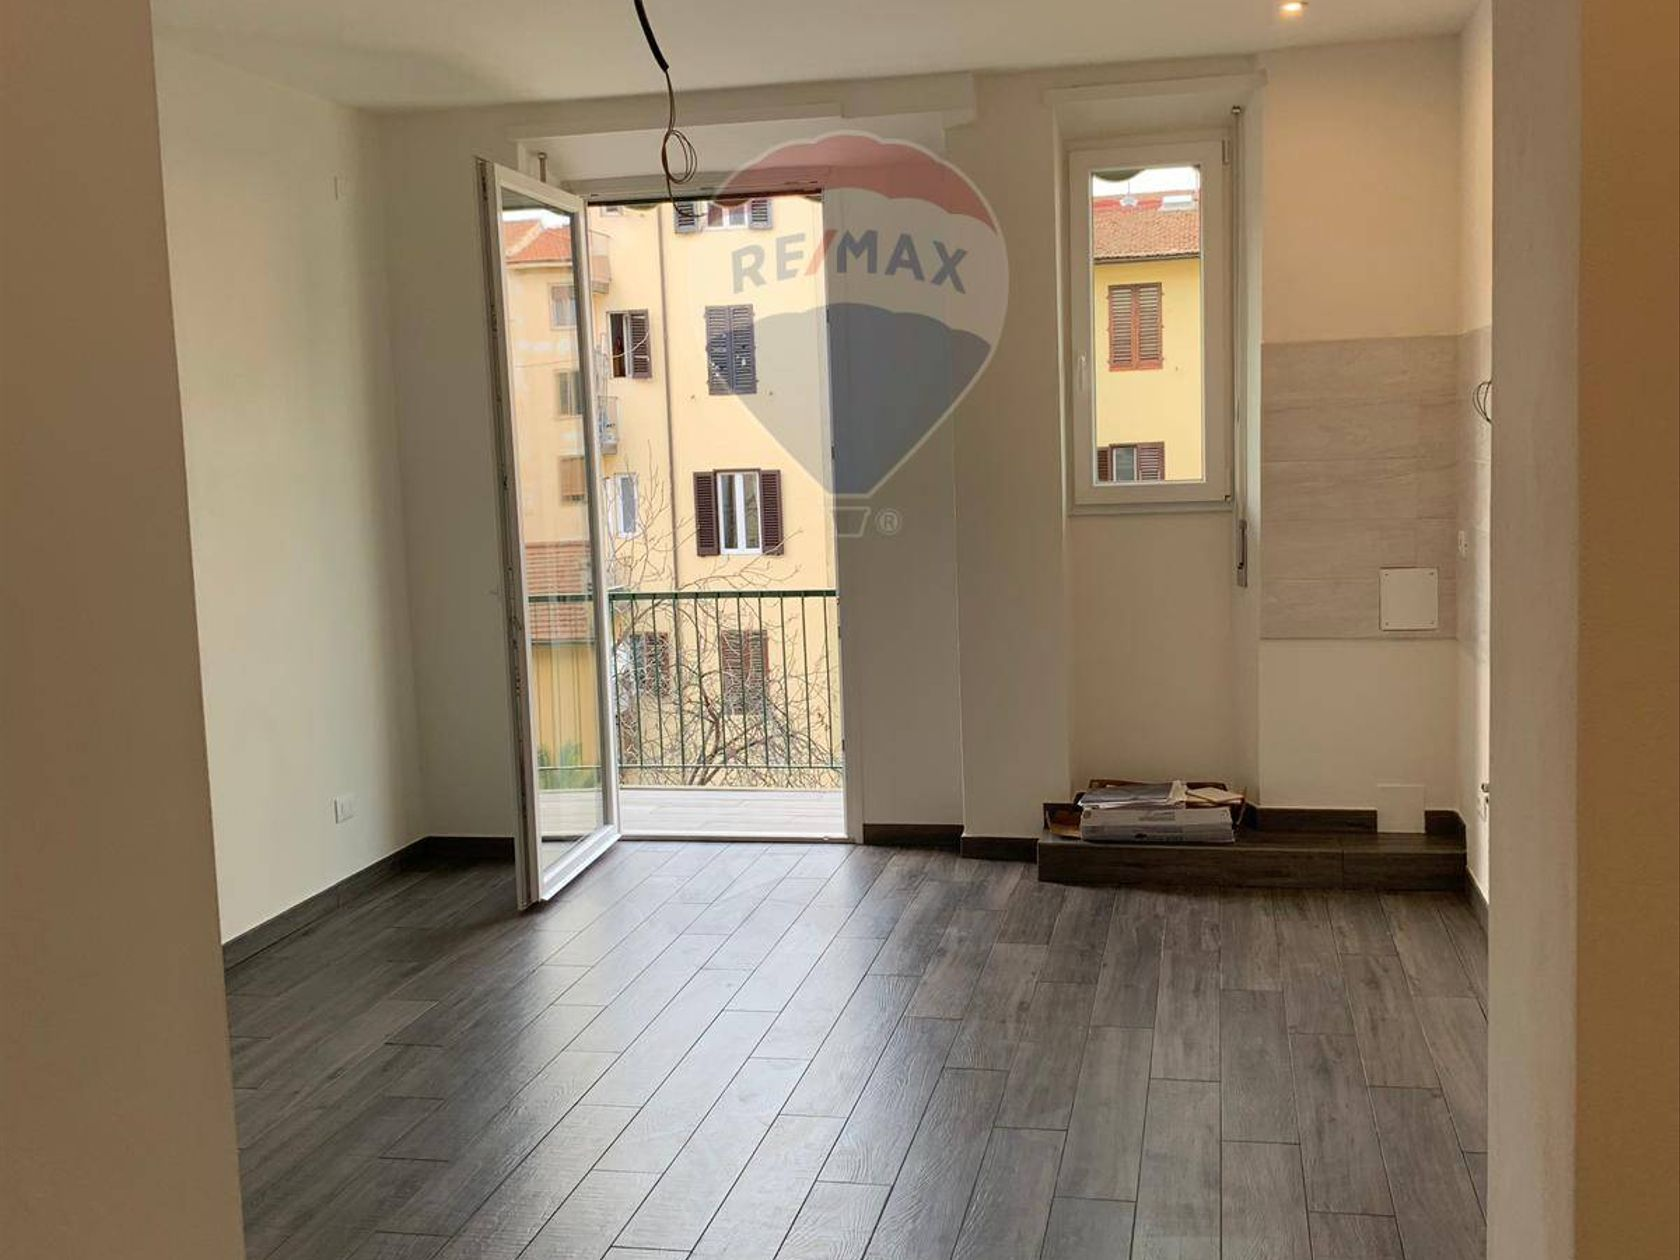 Appartamento San Iacopino, Firenze, FI Vendita - Foto 12